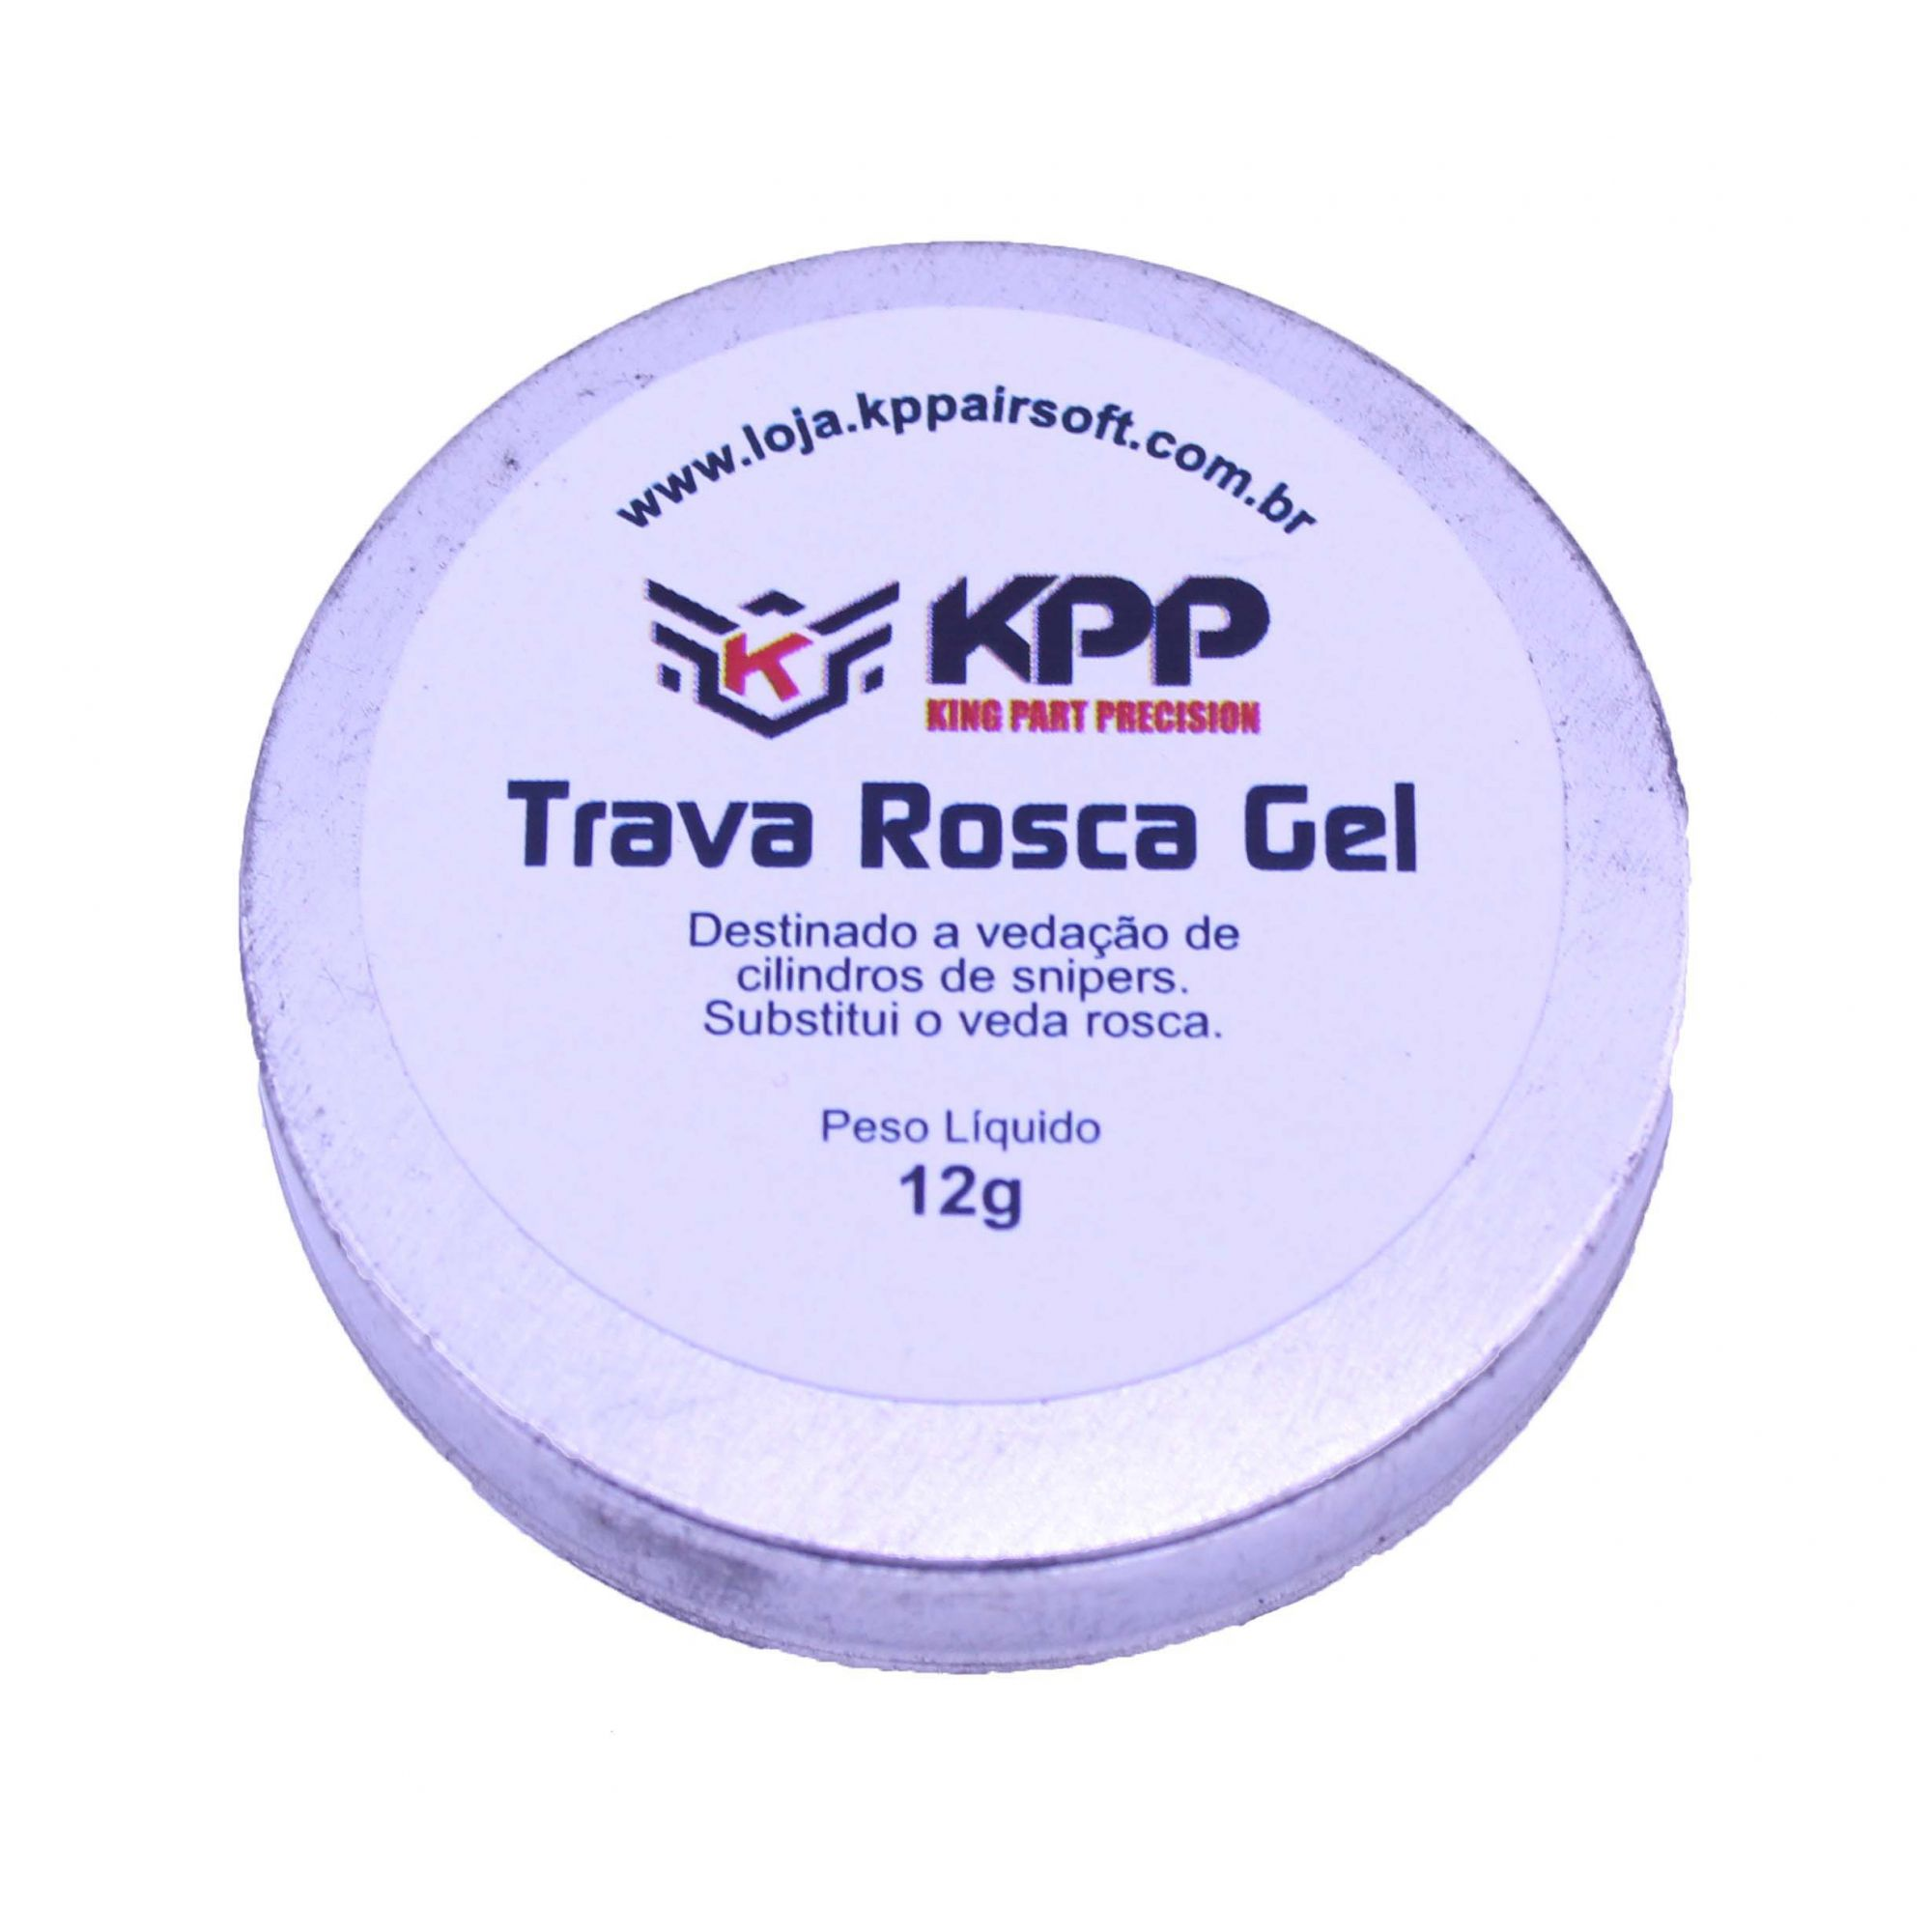 Trava Rosca Gel